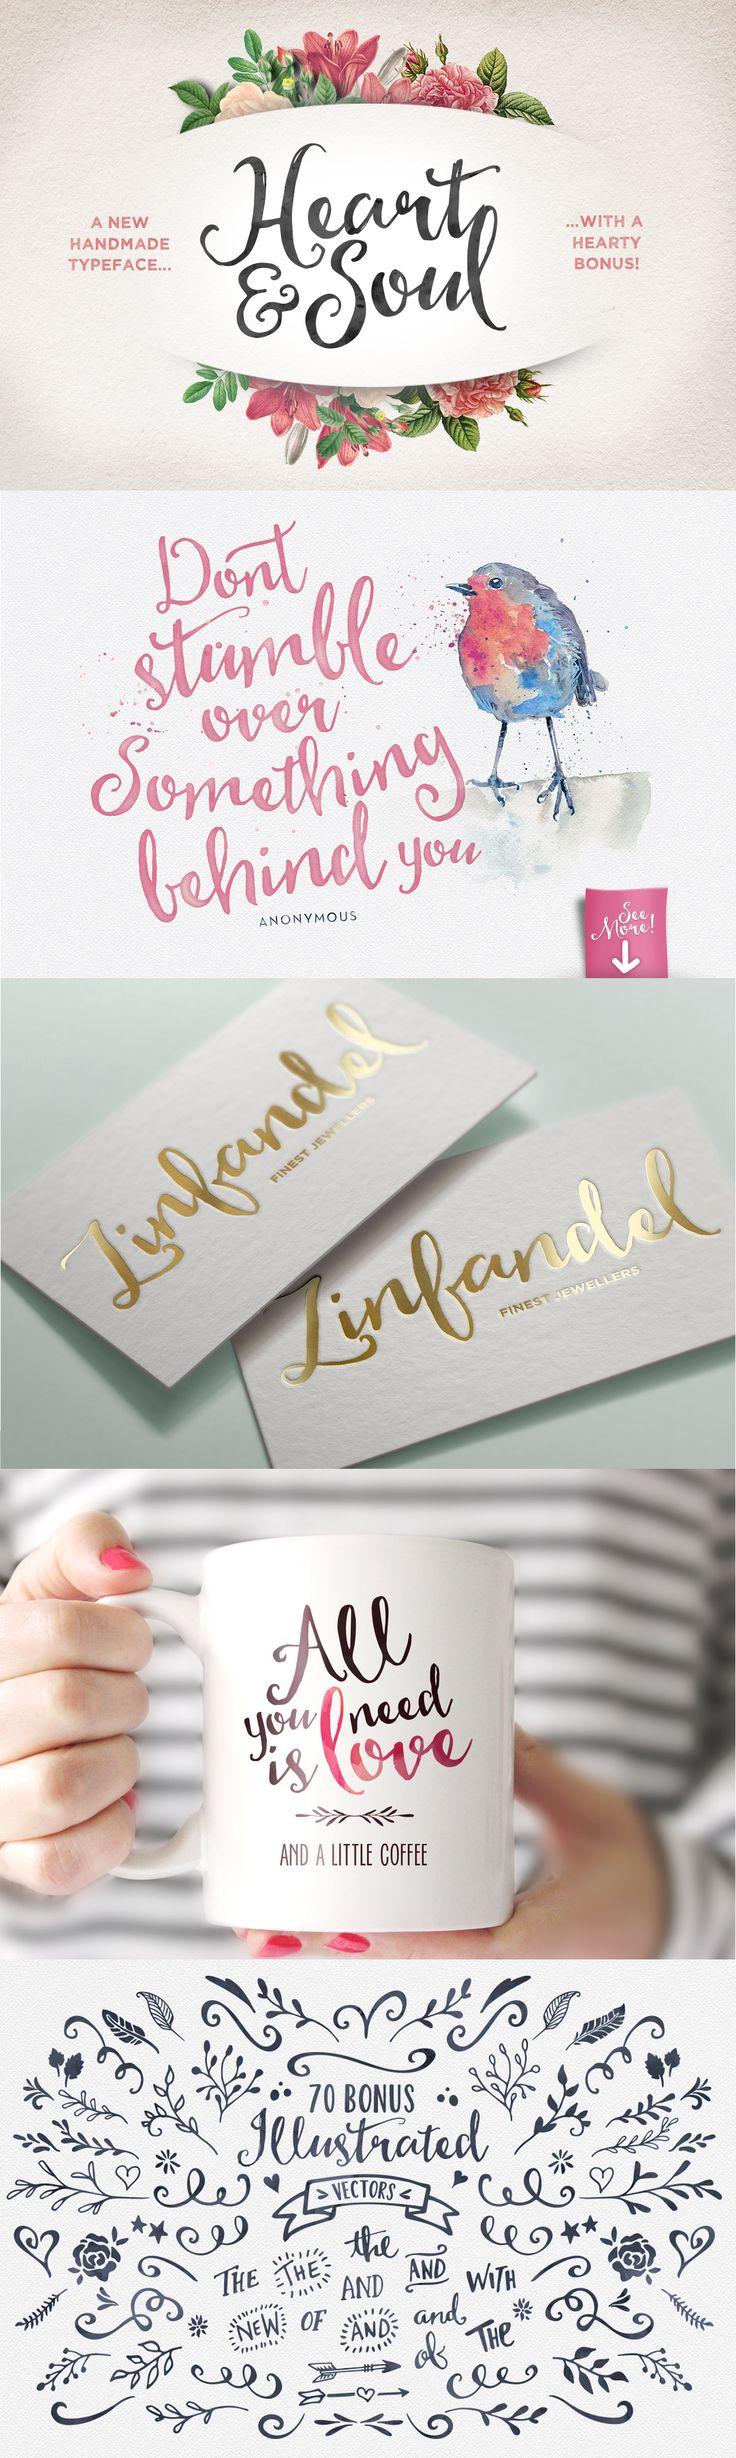 Heart & Soul Typeface by Nicky Laatz #designtools #font #lettering #type